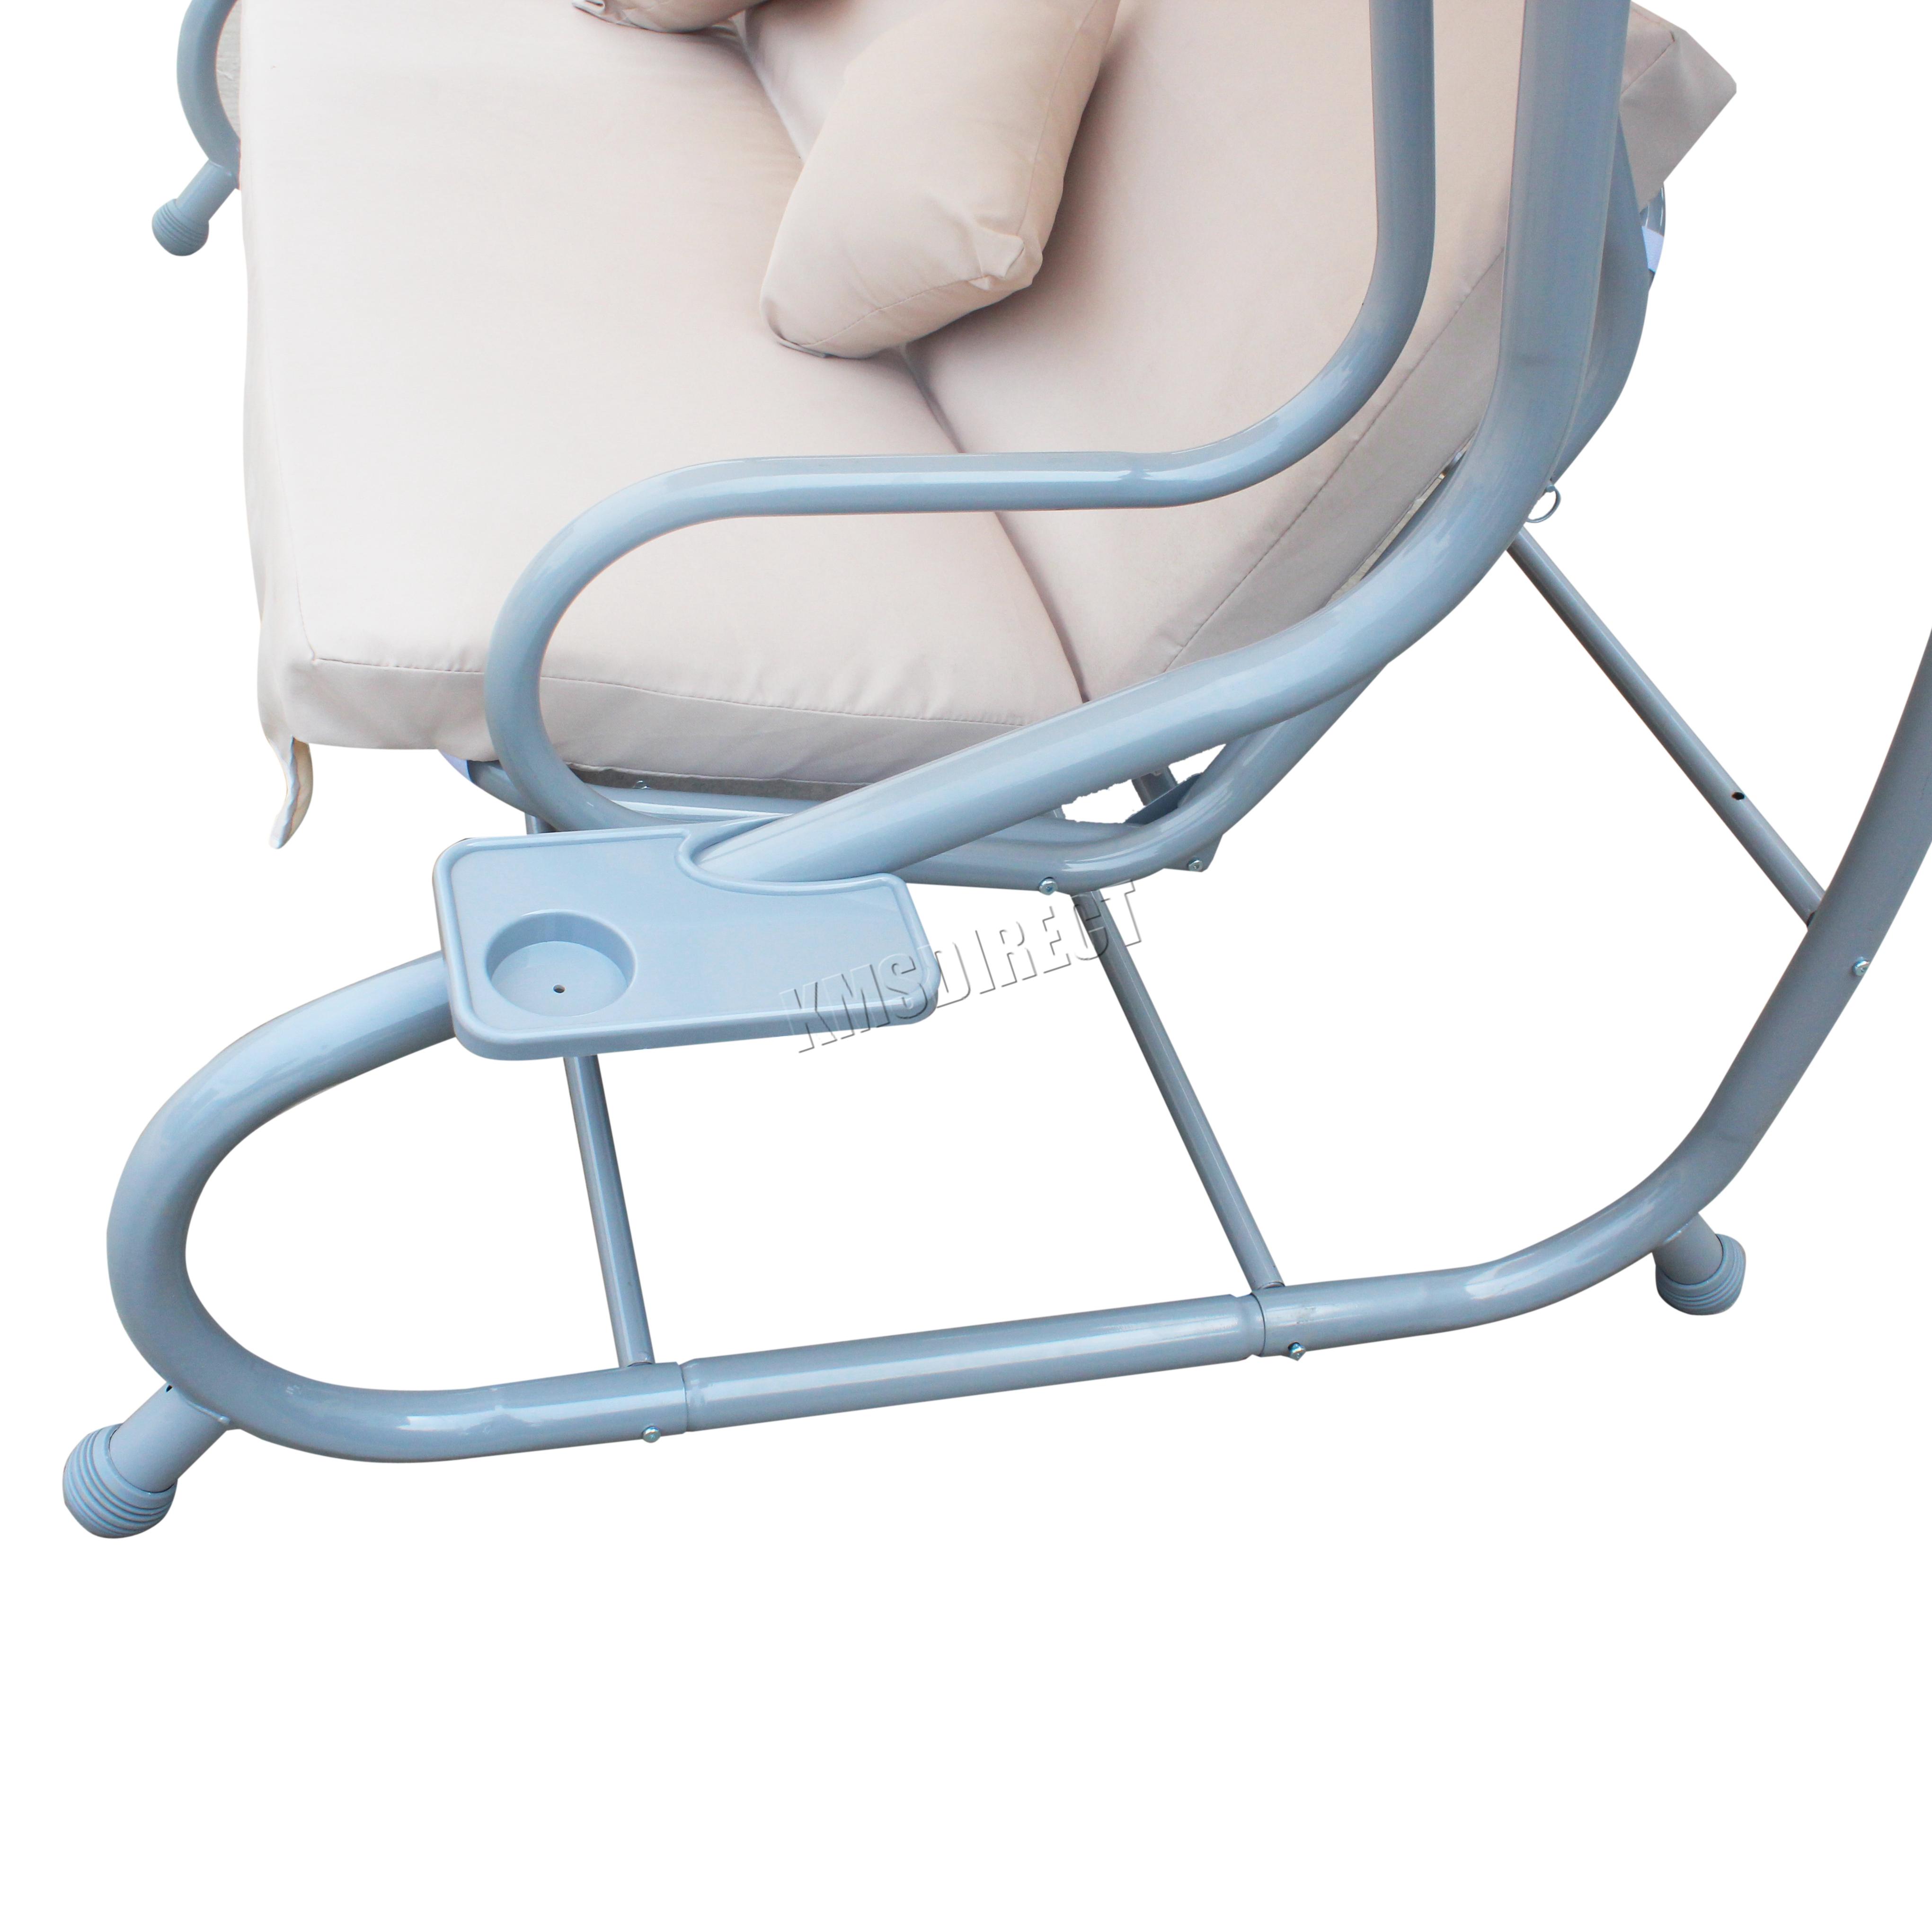 FoxHunter Beige Garden Metal Swing Hammock 3 Seater Chair Bed